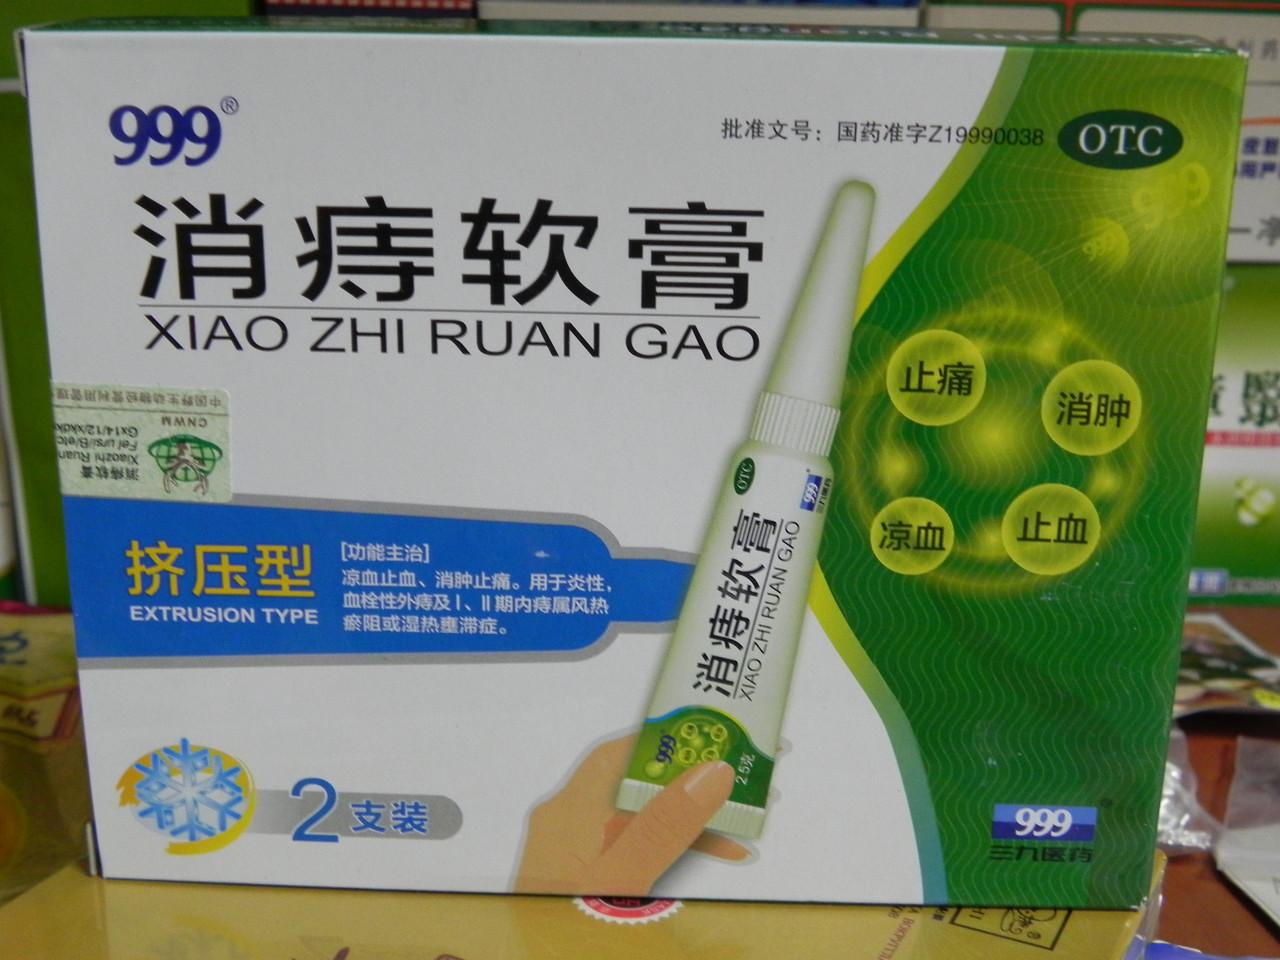 Мазь «Сяо Чжи Руань Гао» 999, от геммороя (Xiaozhi Ruangao2 тюб/./2.5 гр.)